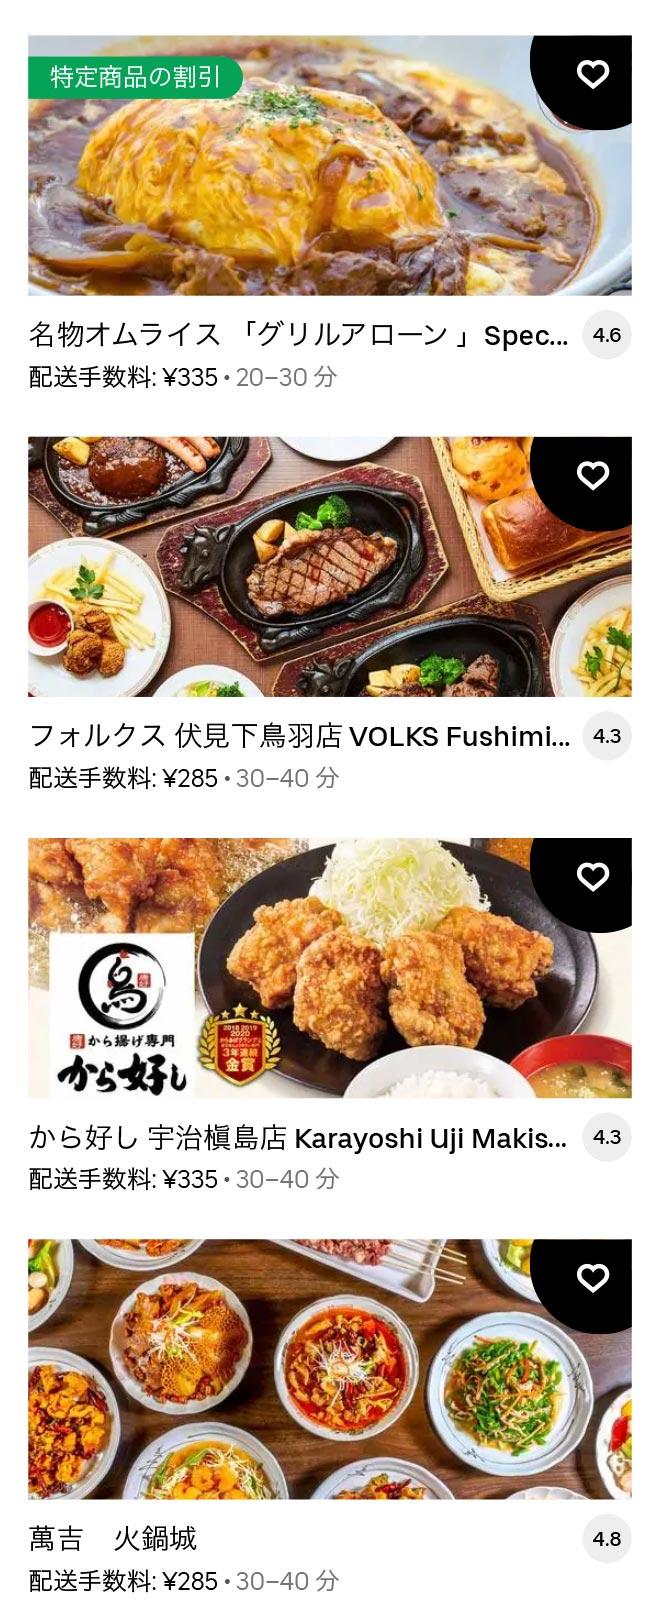 U fushimi momoyama 2105 12